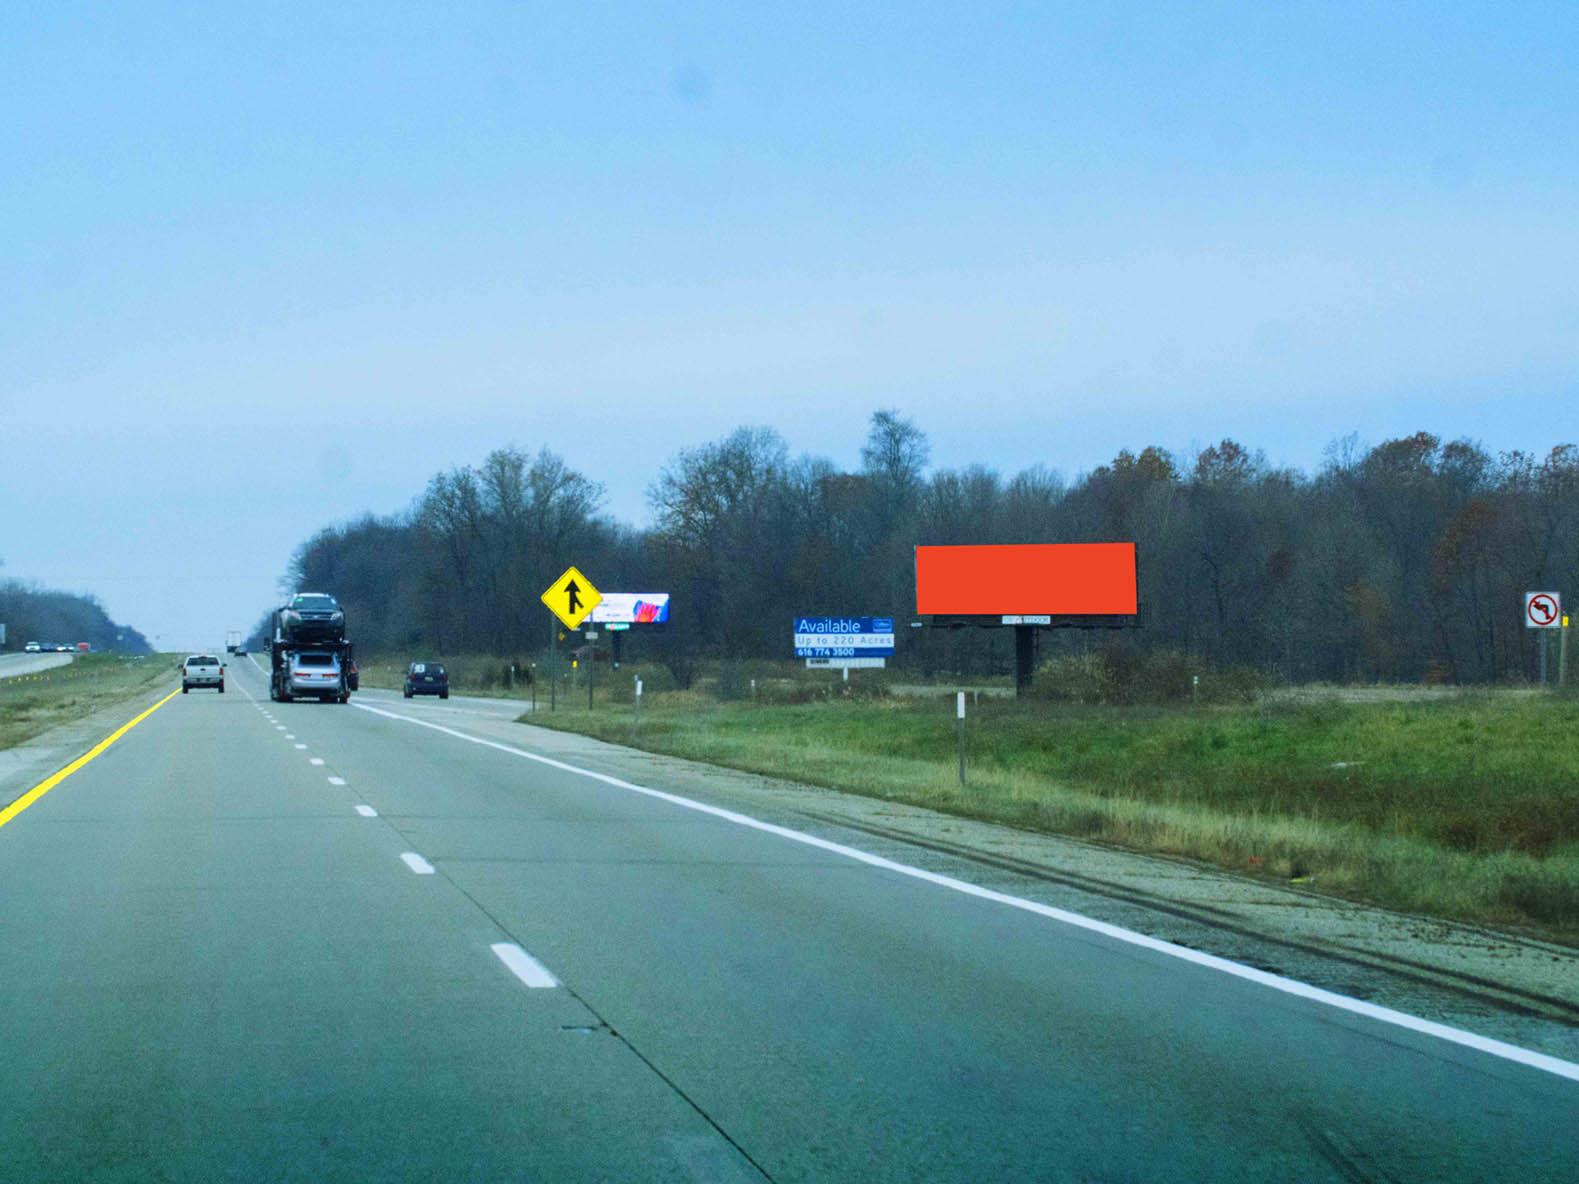 Billboard 224 East (10.6 x 36) - Geopath: 30655484